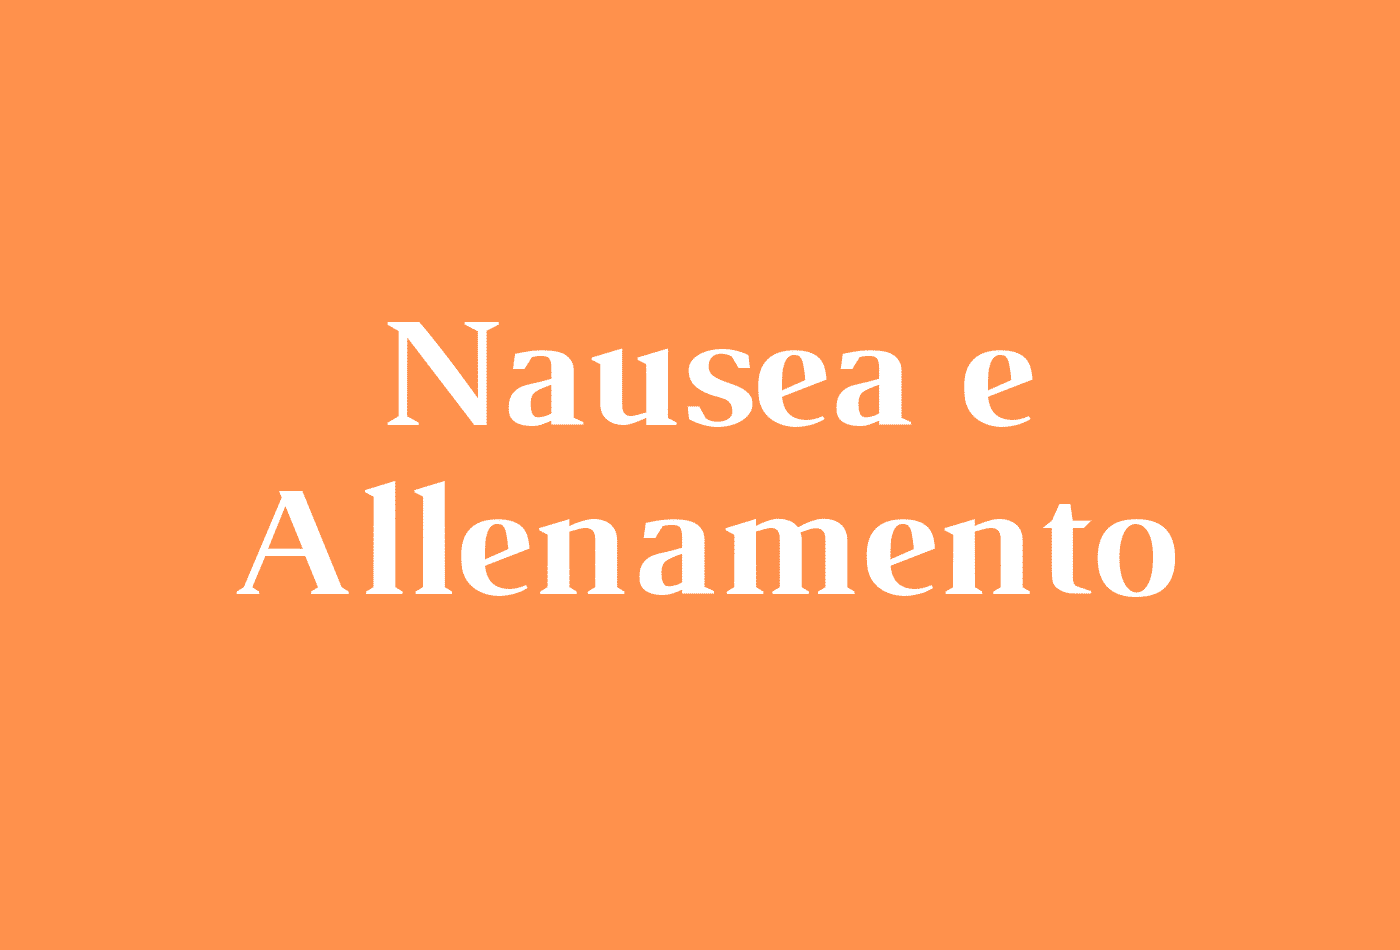 Nausea e Allenamento